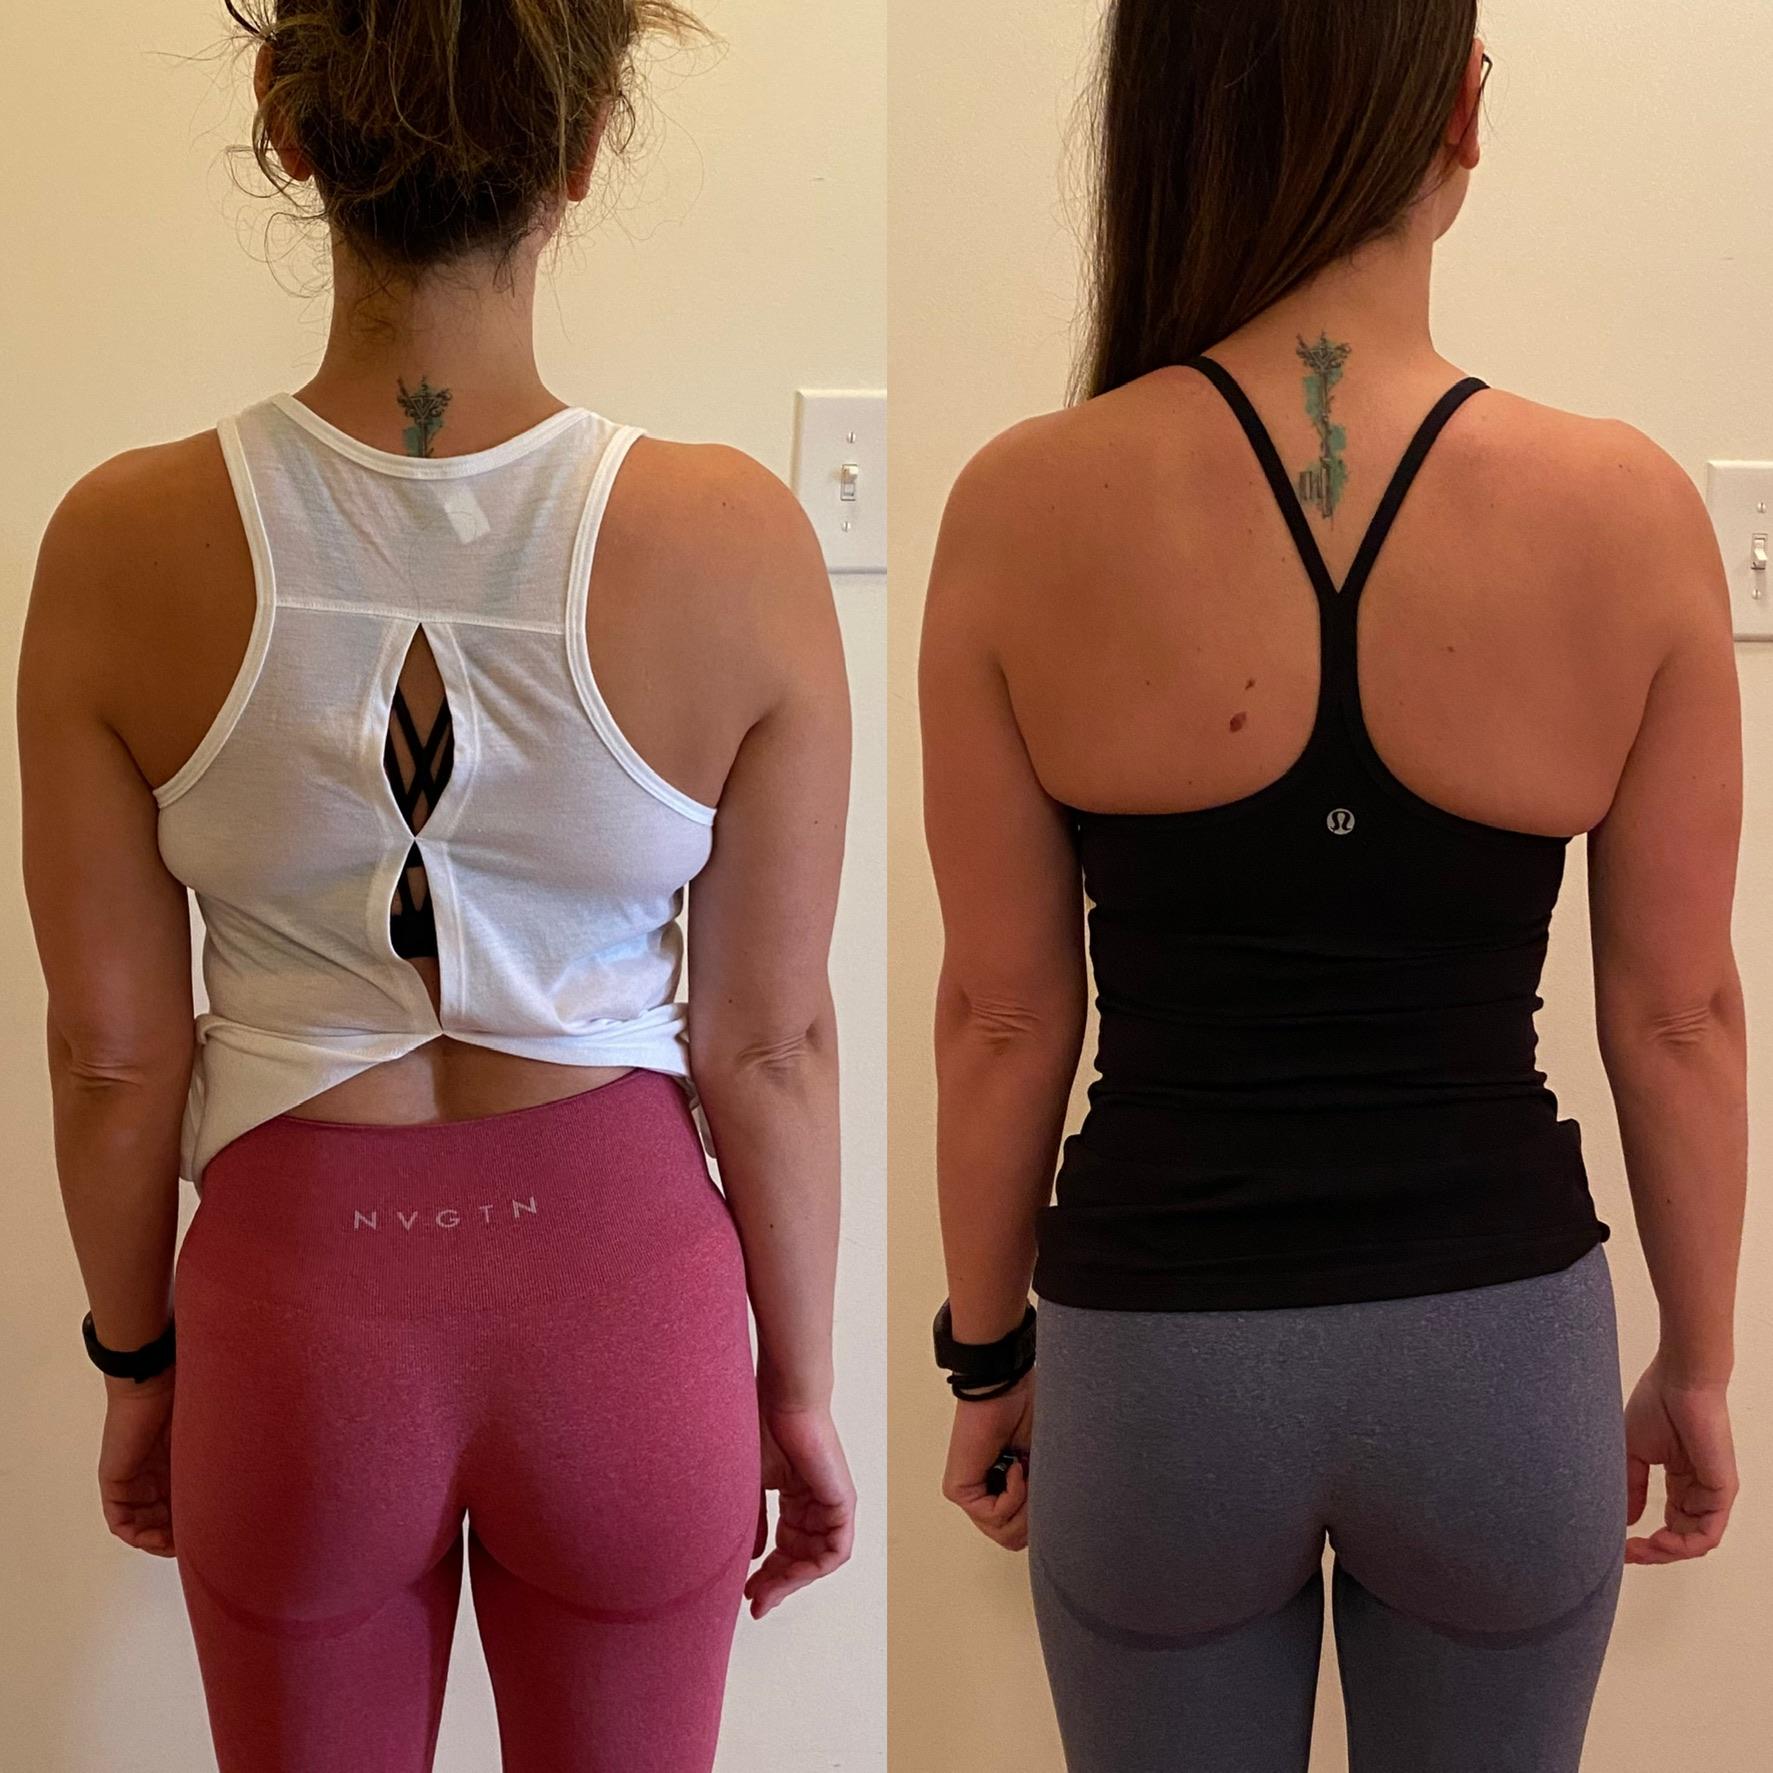 1 month Transformation